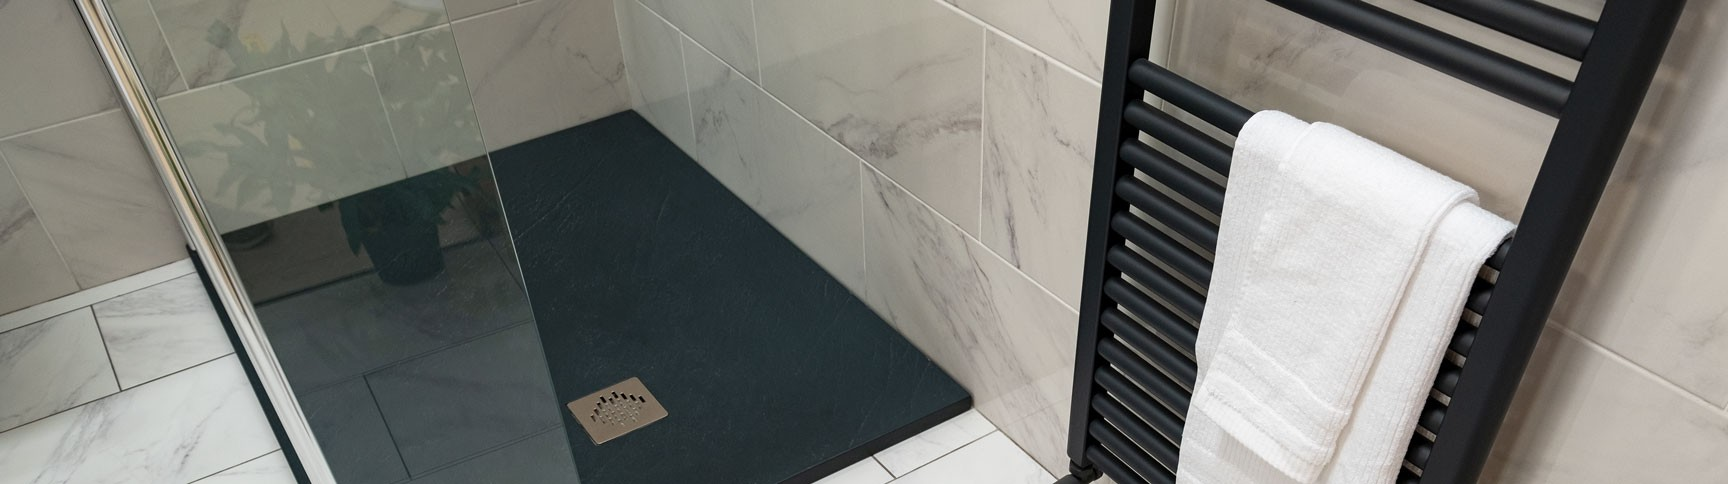 Heated Towel Rails   Radiators   Central Heating   World of Tiles